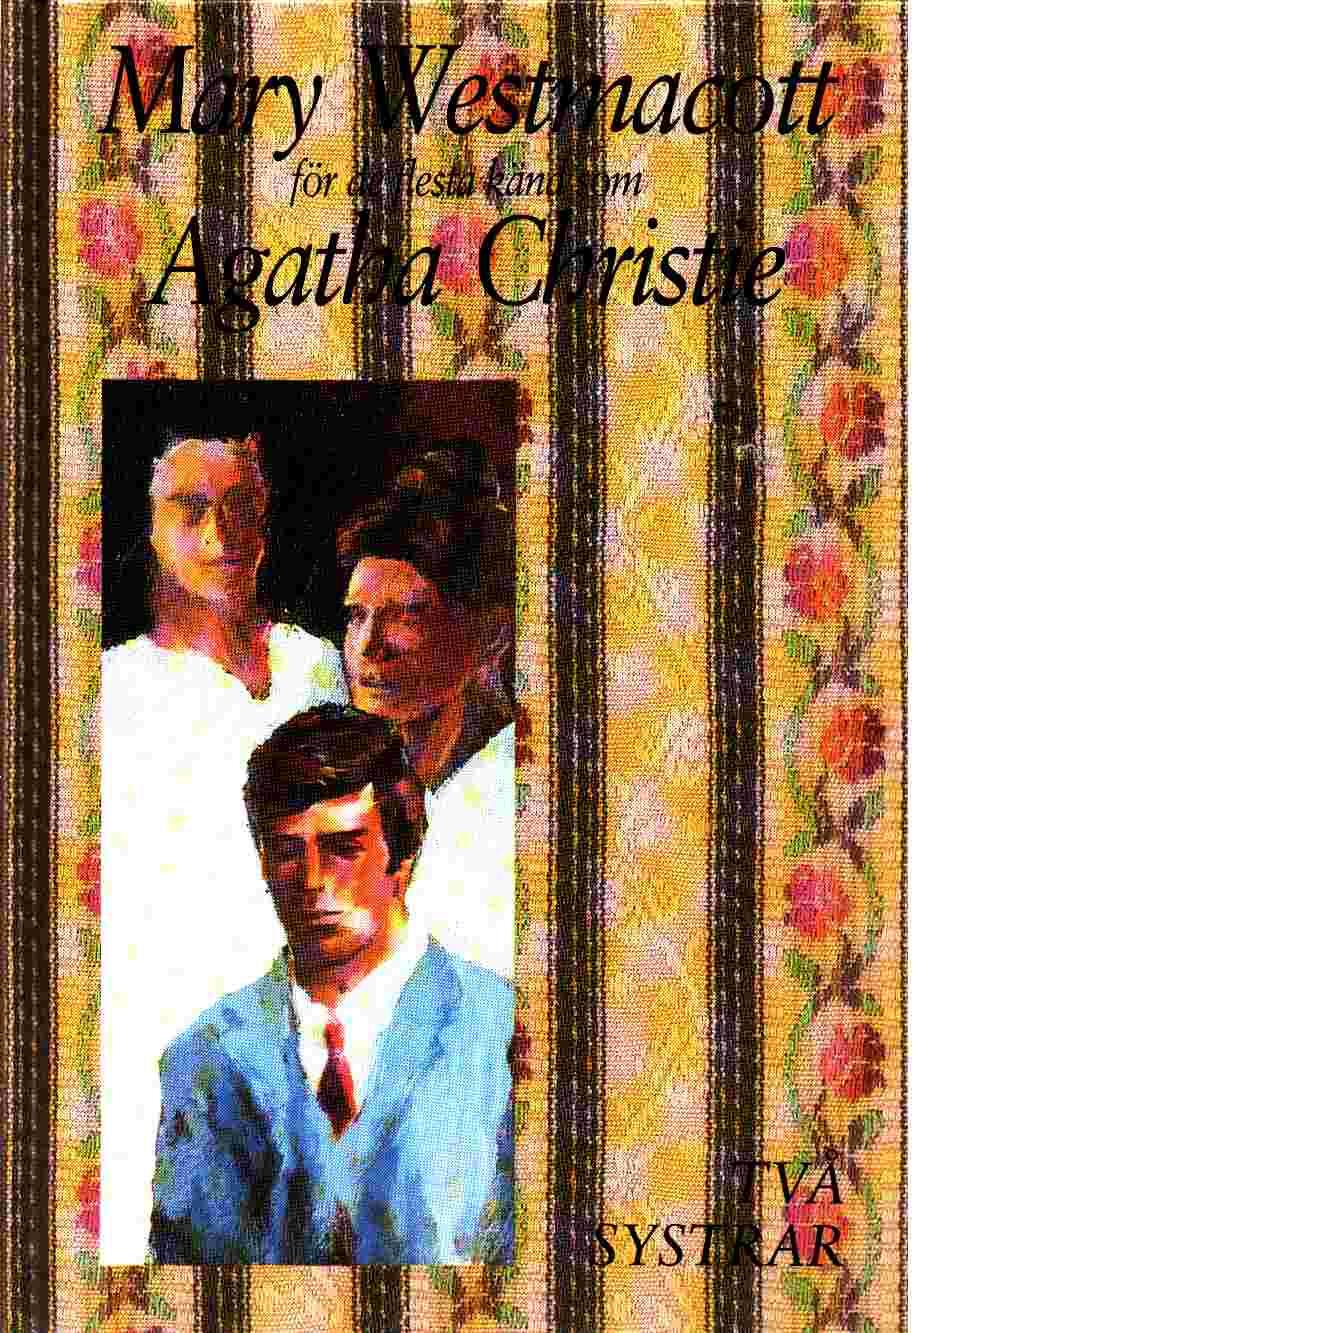 Två systrar - Westmacott, Mary känd som Agatha Christie